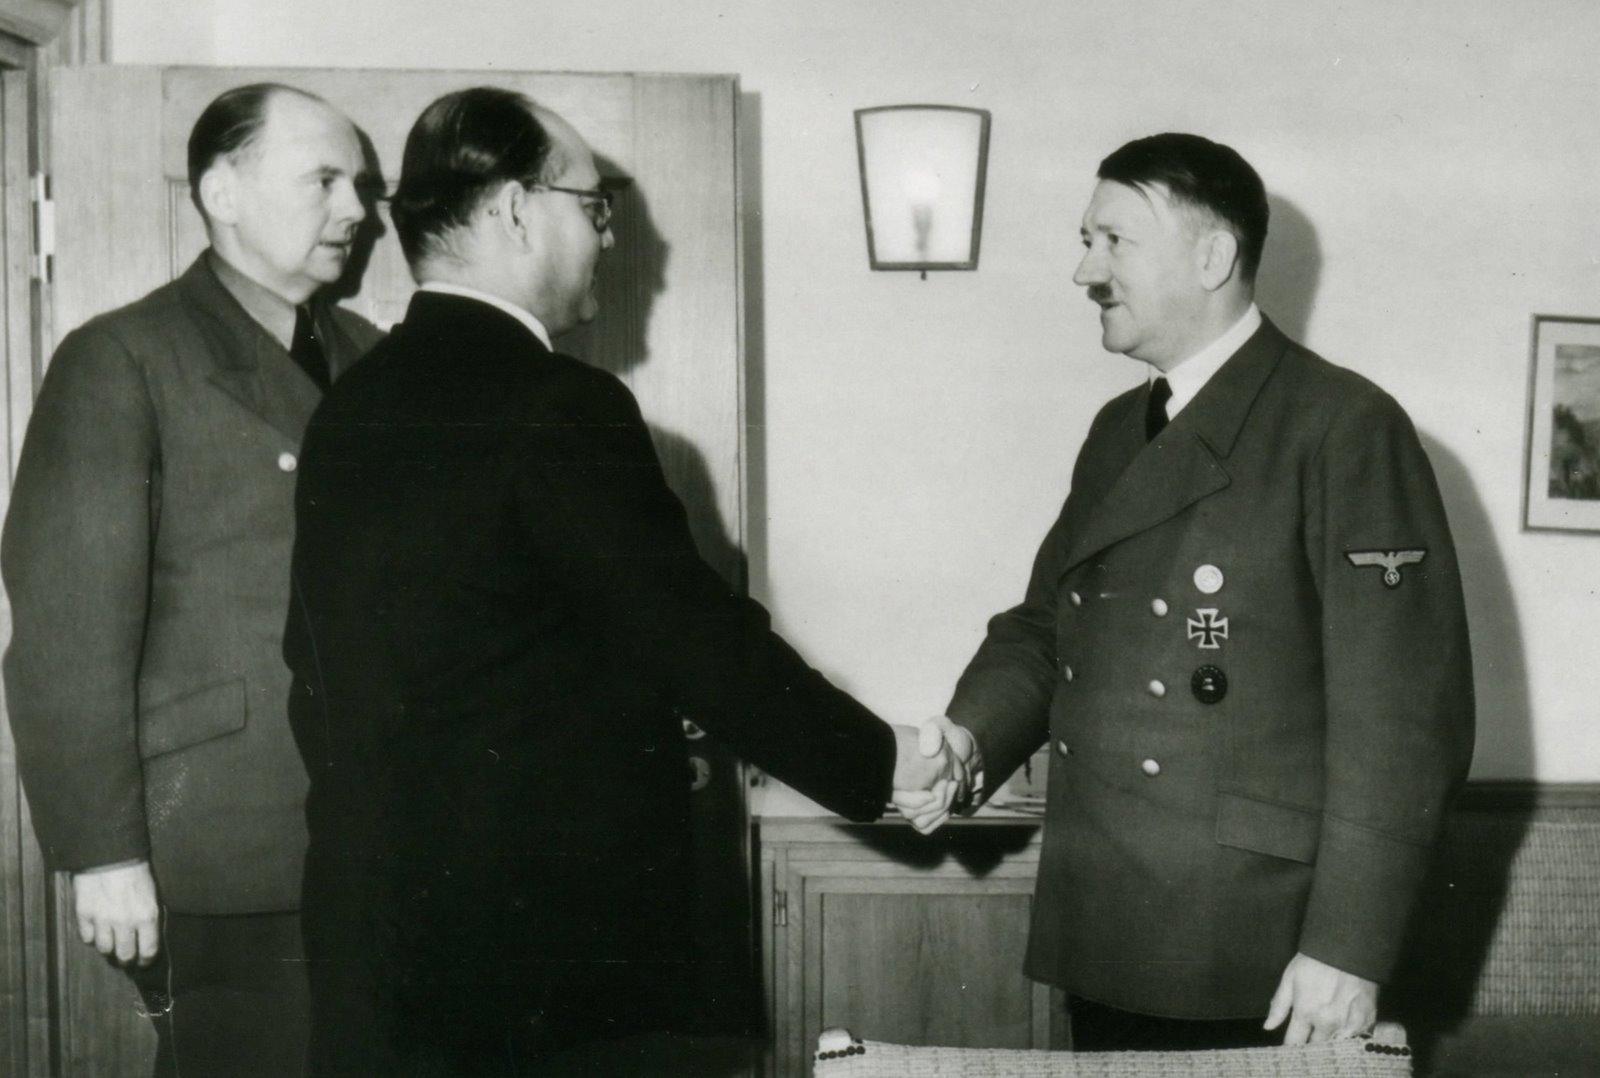 hitler as influential leader